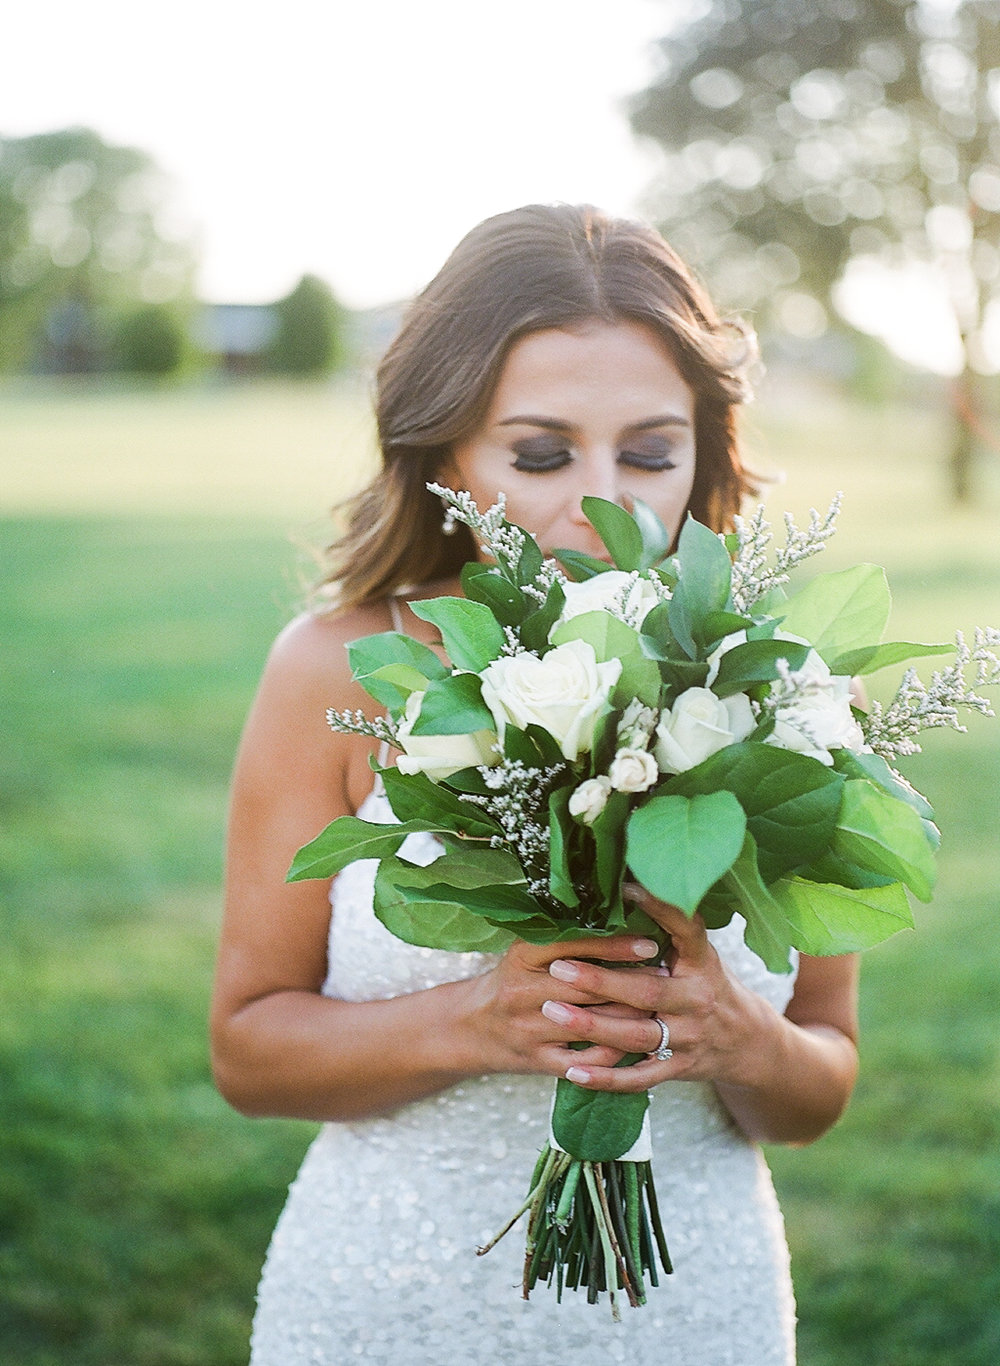 Bonphotage Chicago Fine Art Wedding Photography - Morton Arboretum